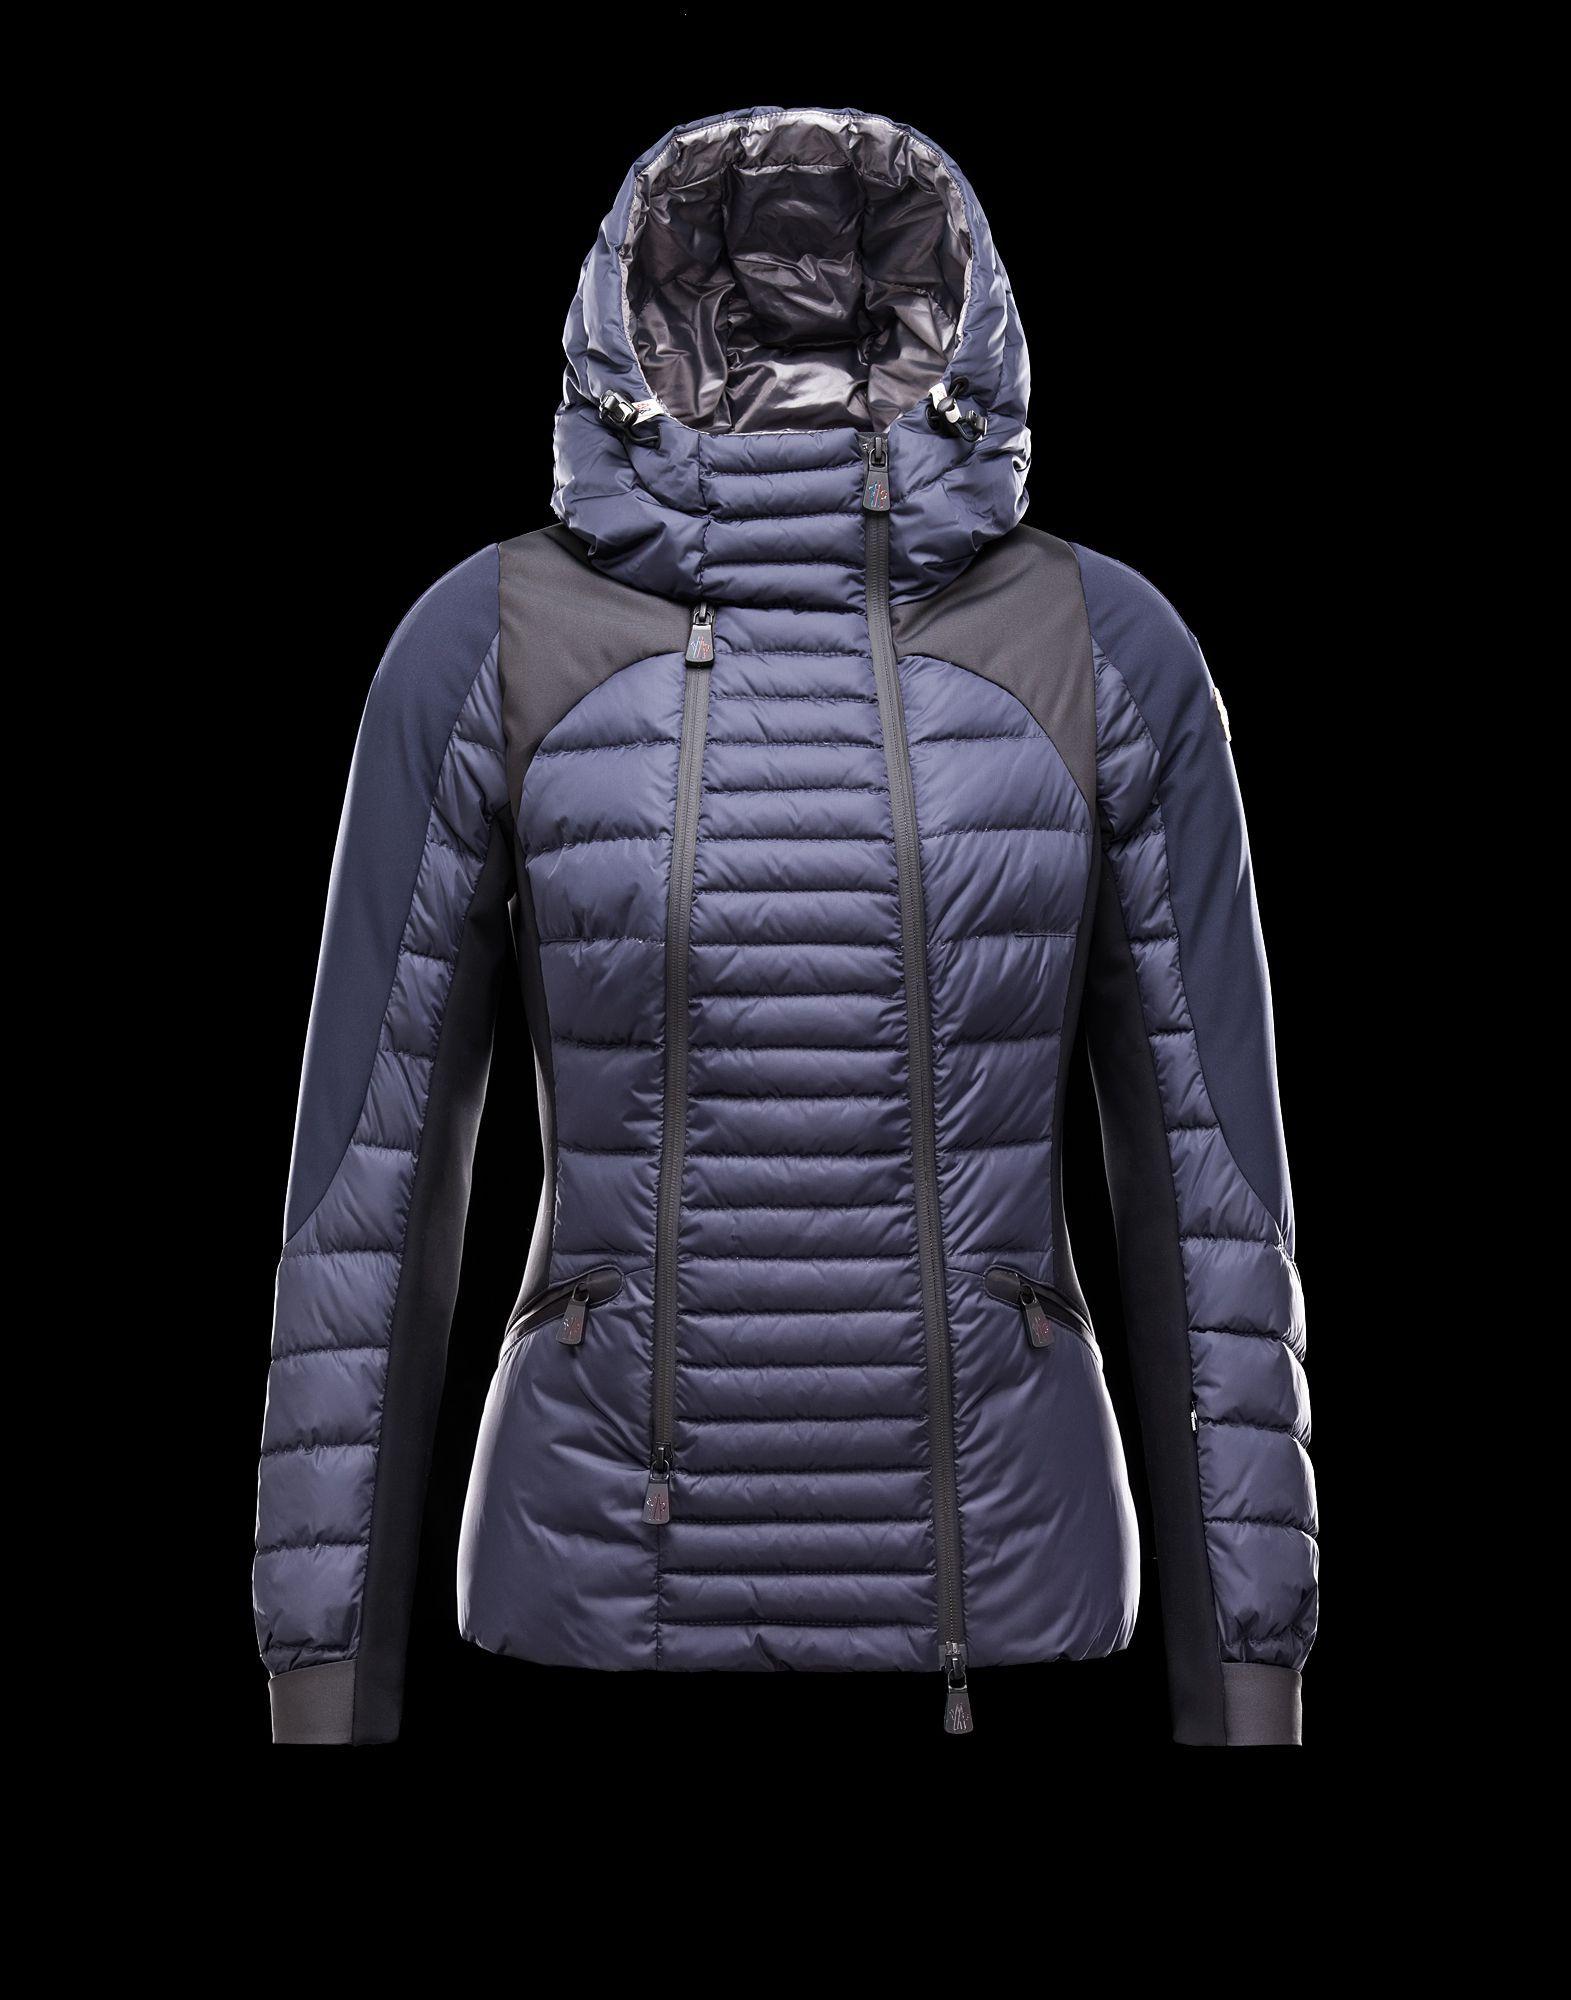 Moncler grenoble rochebrune Jackets, Moncler, Winter trends